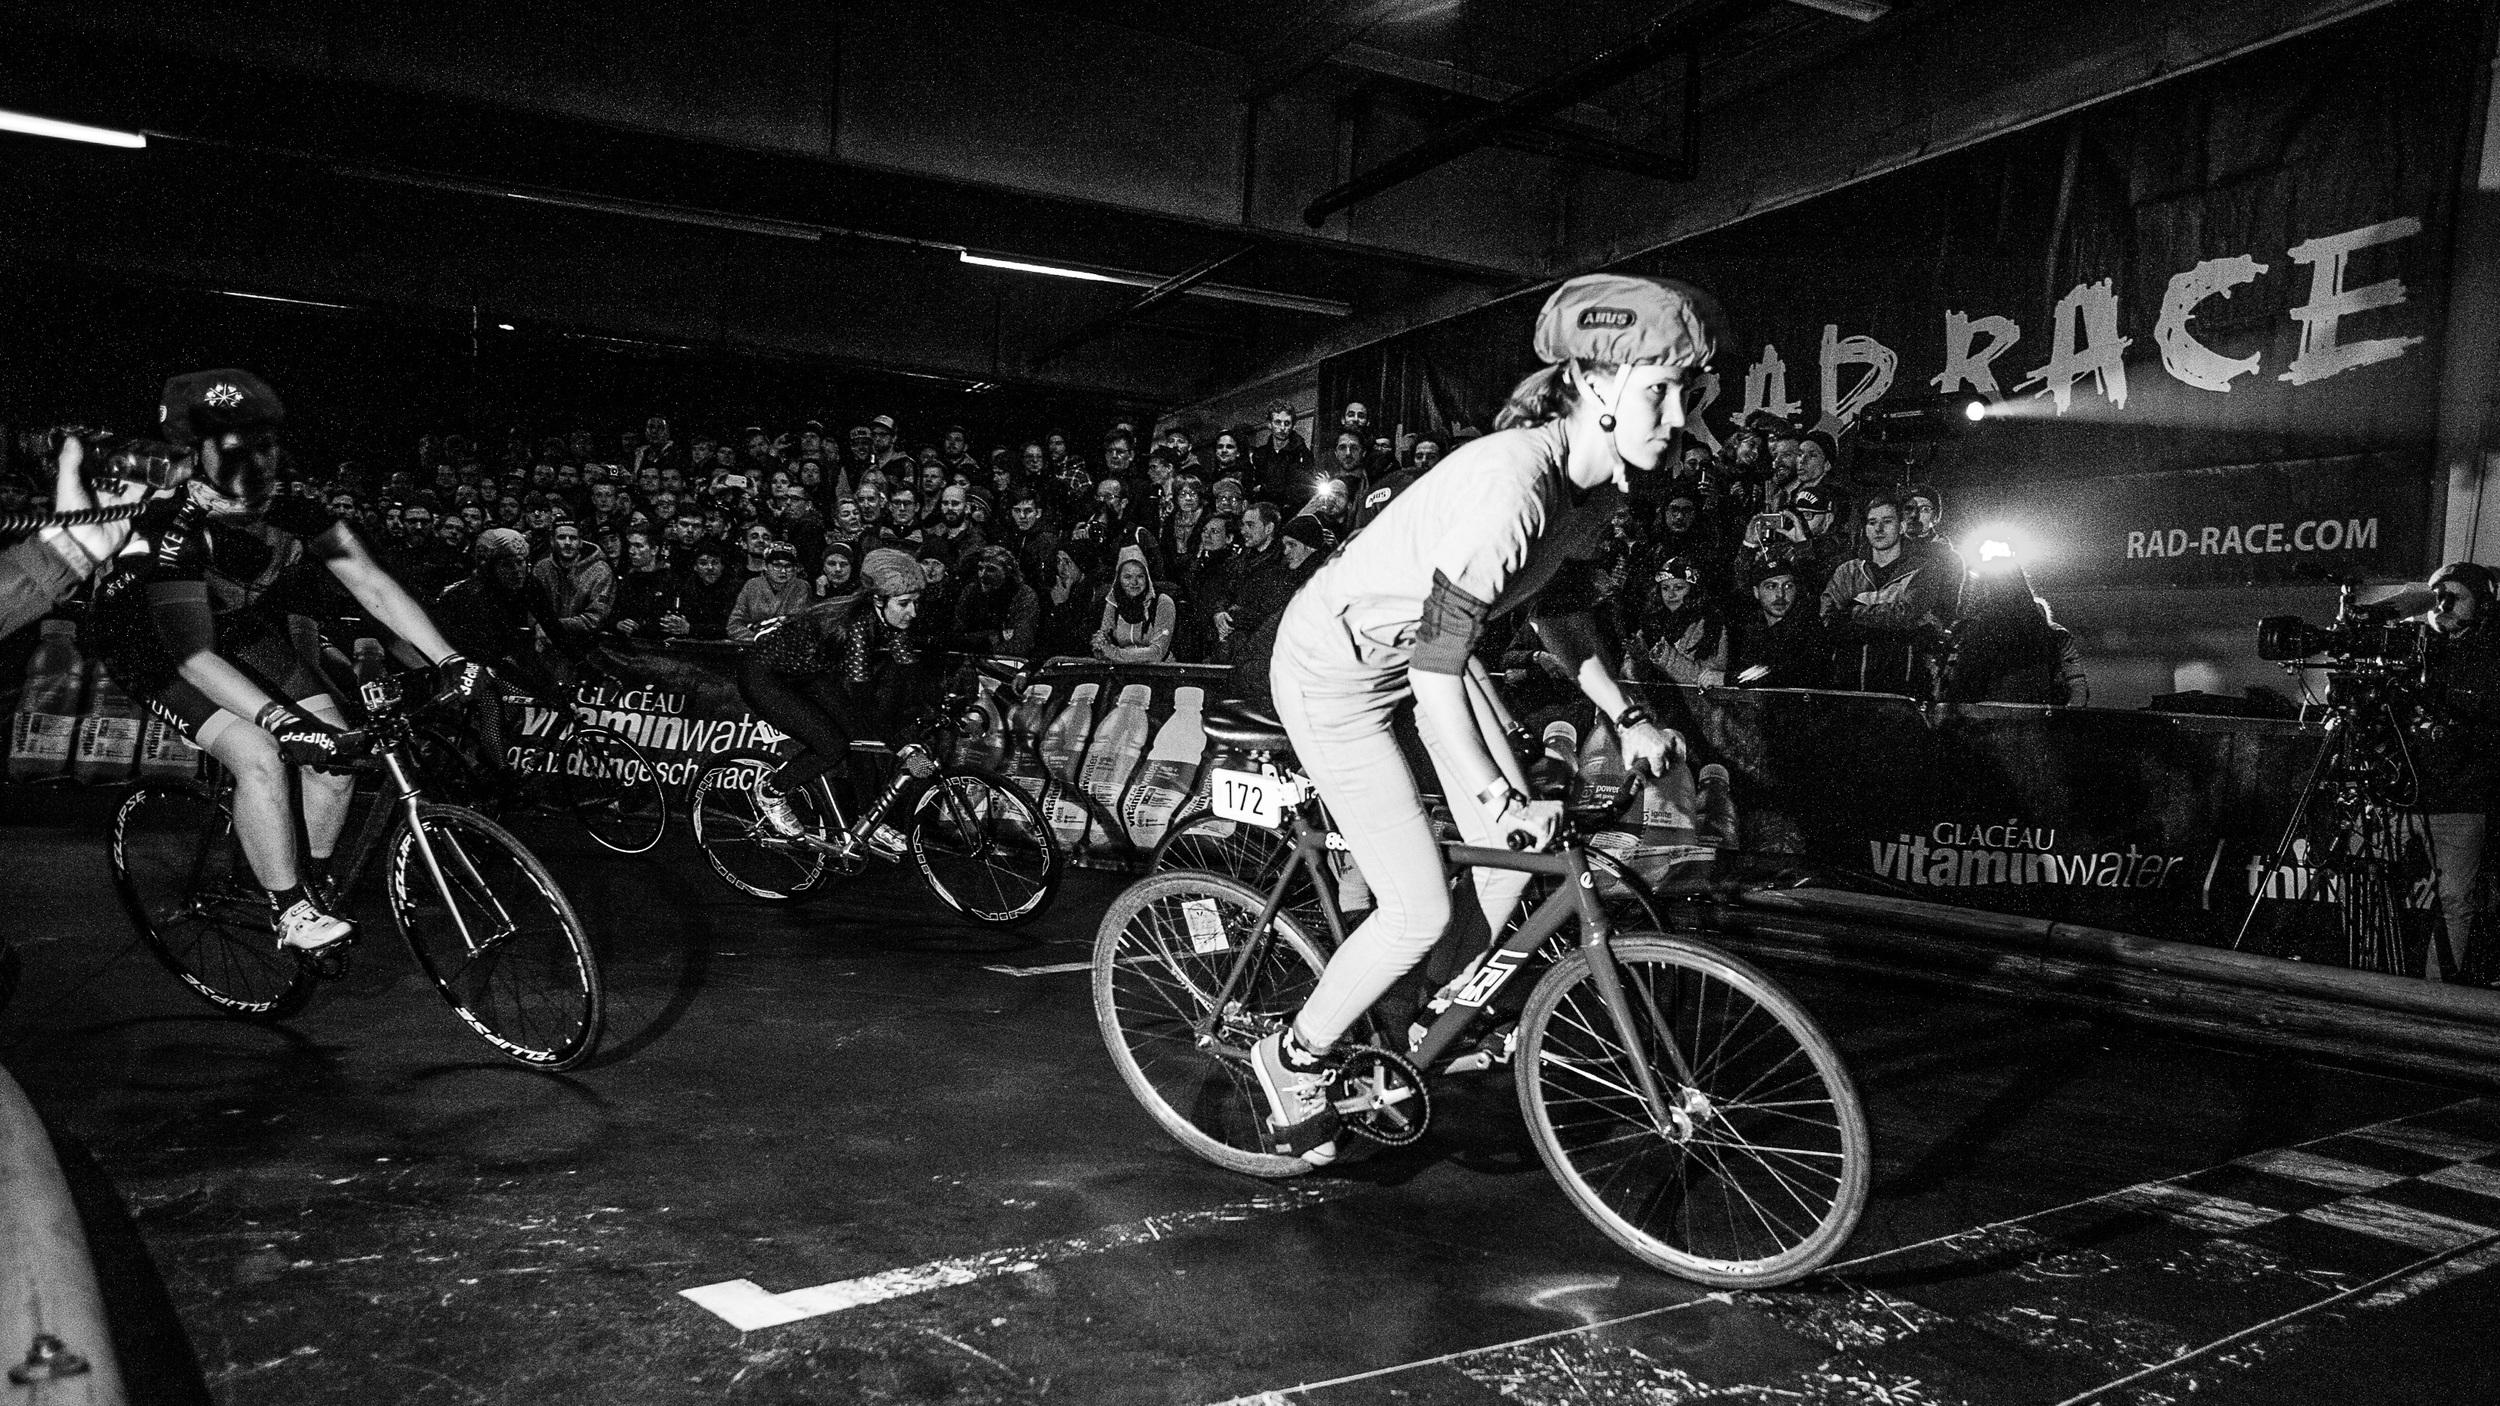 RAD RACE Last Man Standing, Berlin March 19 2016 - Shot by Drew Kaplan 49.jpg